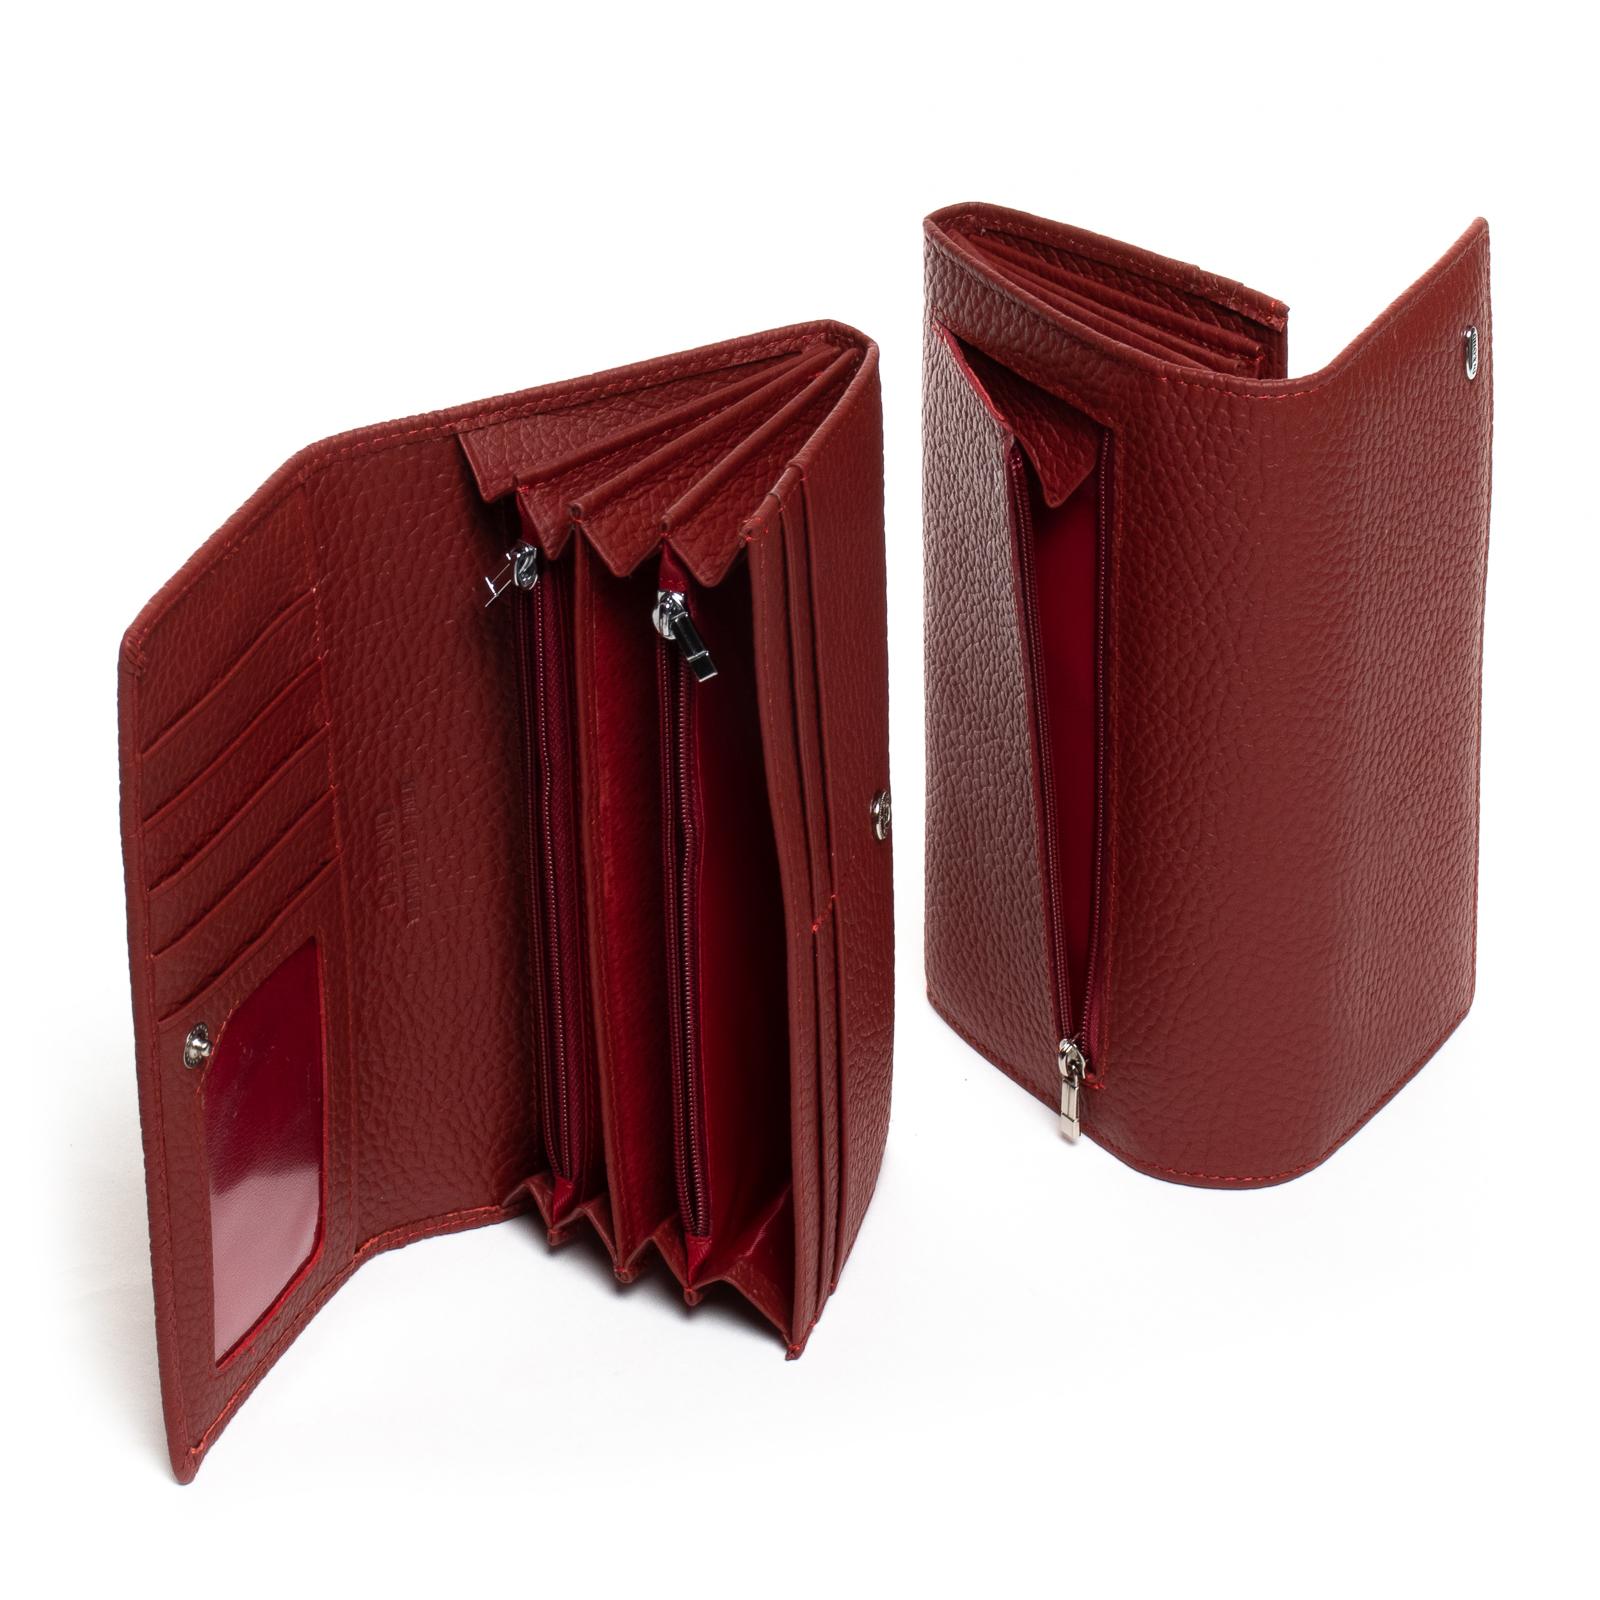 Кошелек Classic кожа DR. BOND W501 red - фото 4